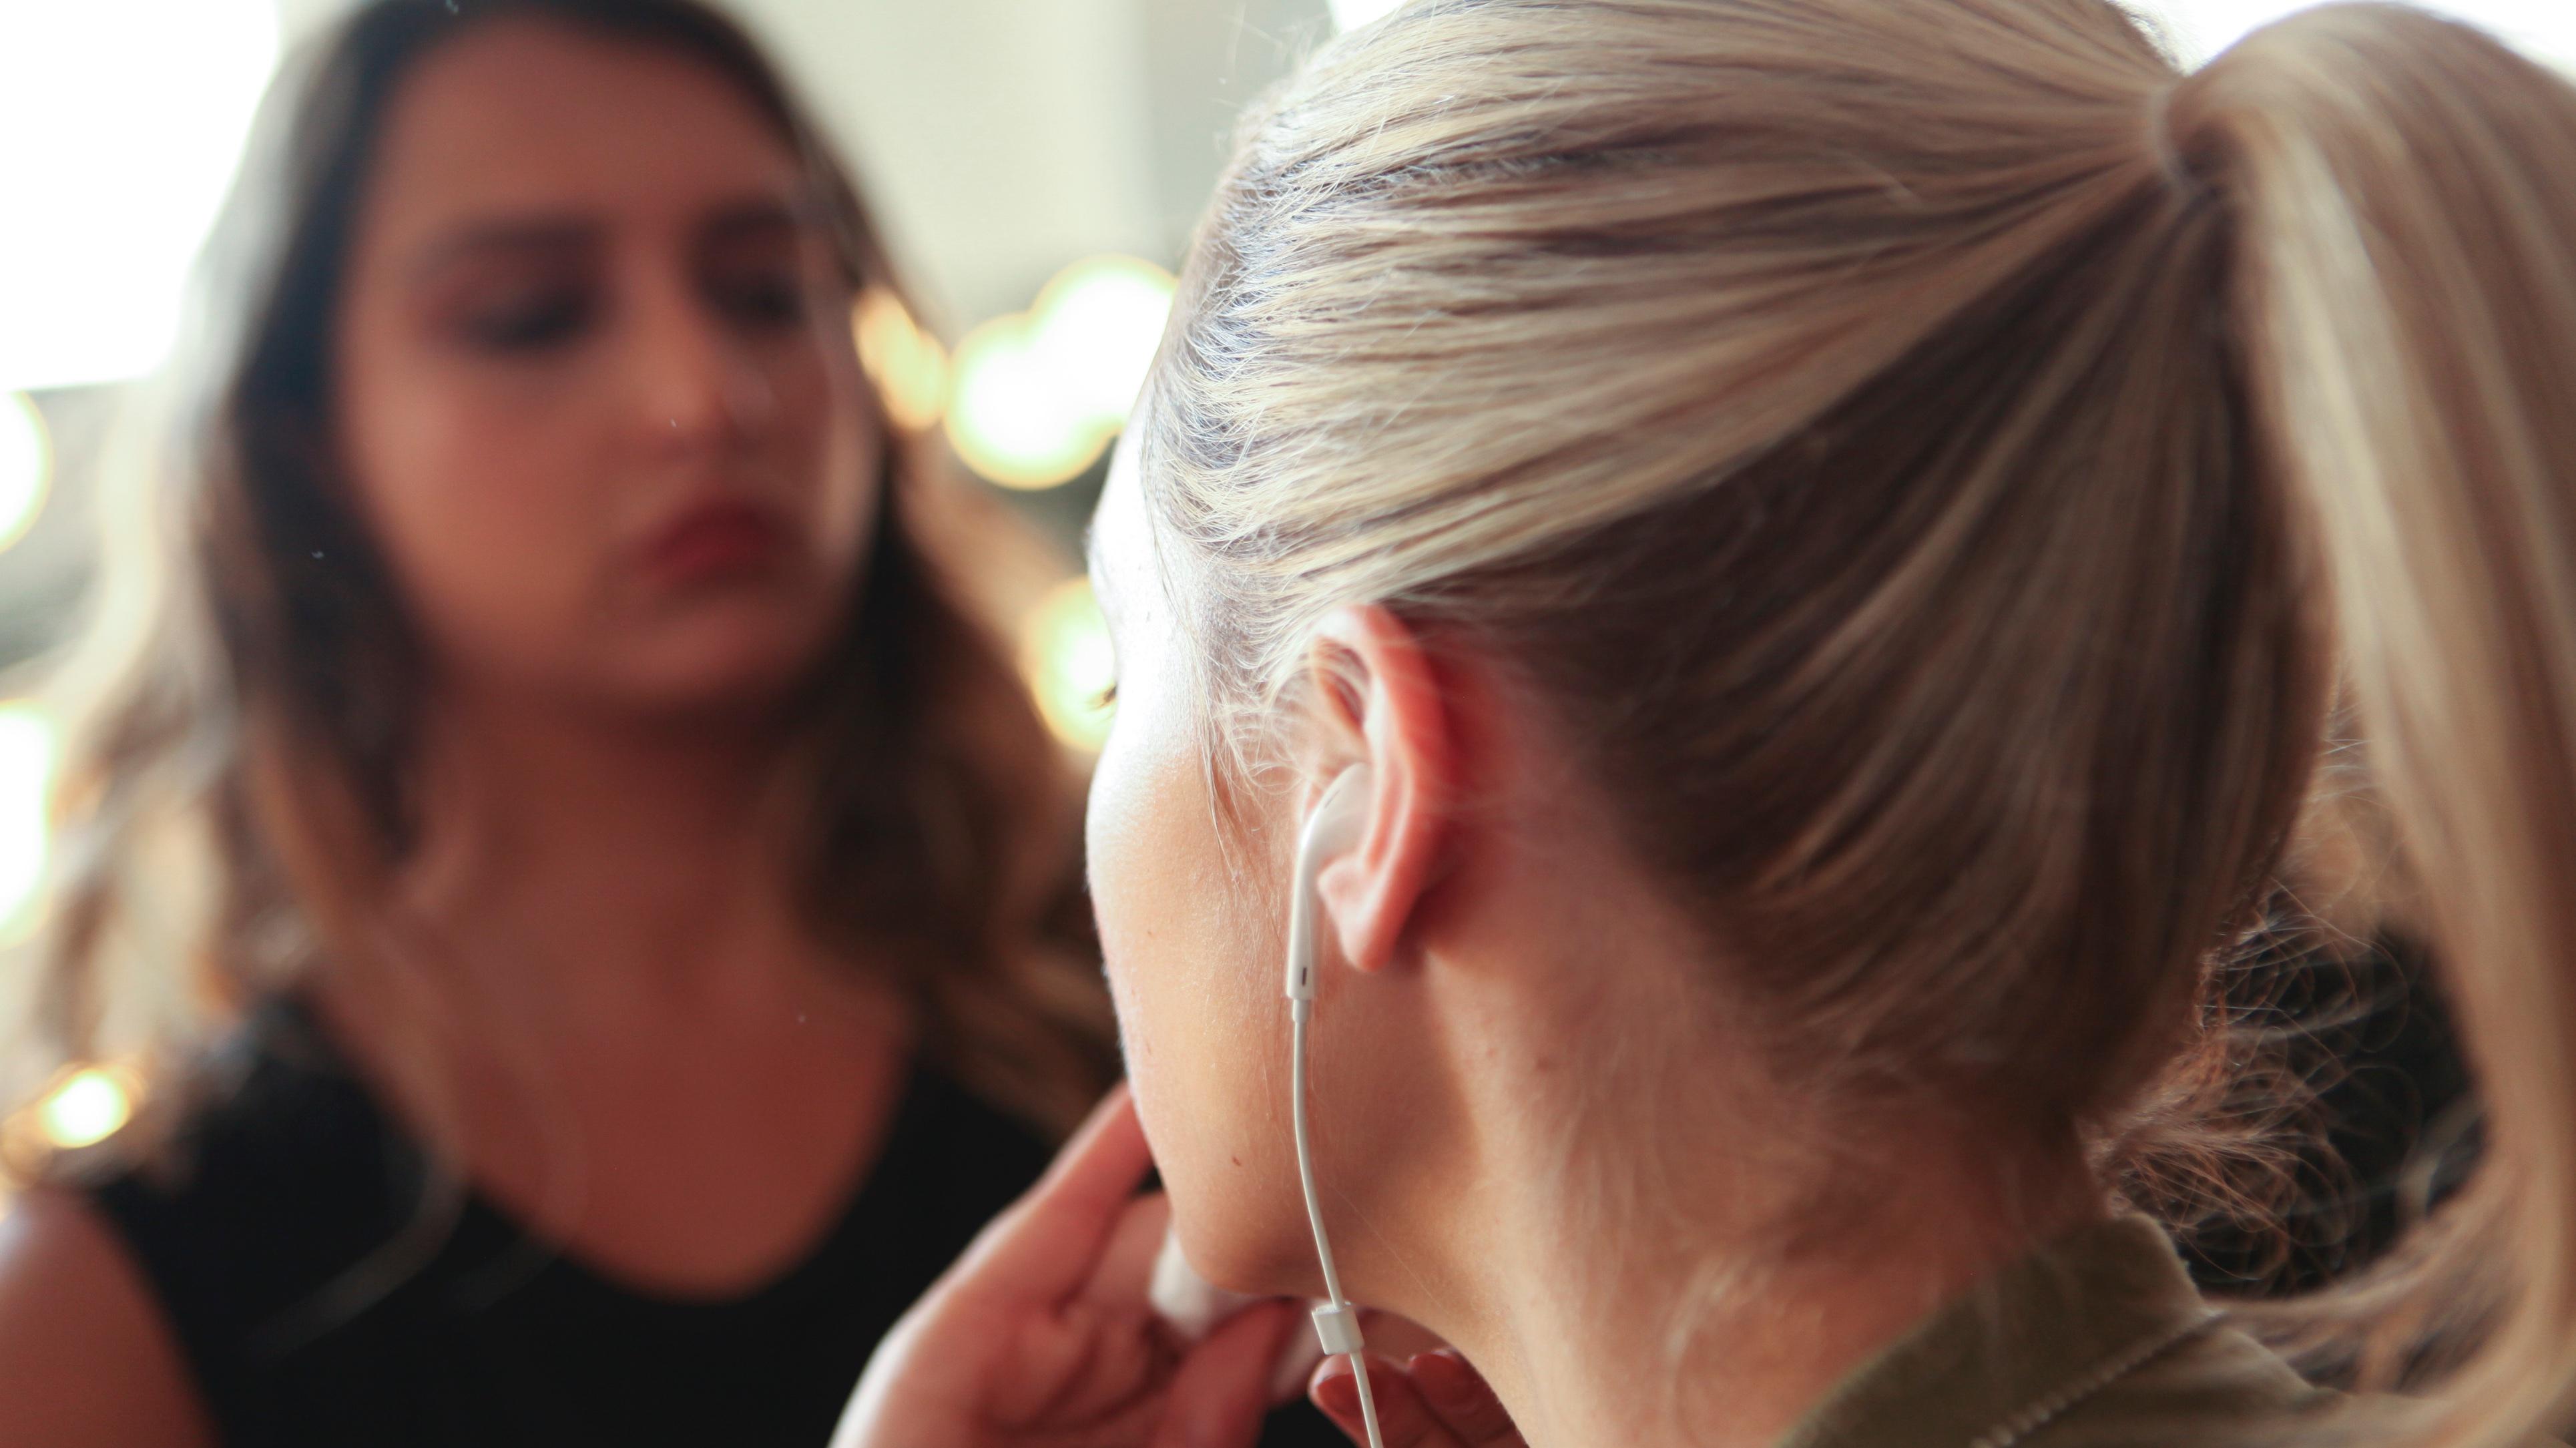 L'Oréal Japan Diagnoses Hair Damage Via Music | Stylus | Innovation Research & Advisory